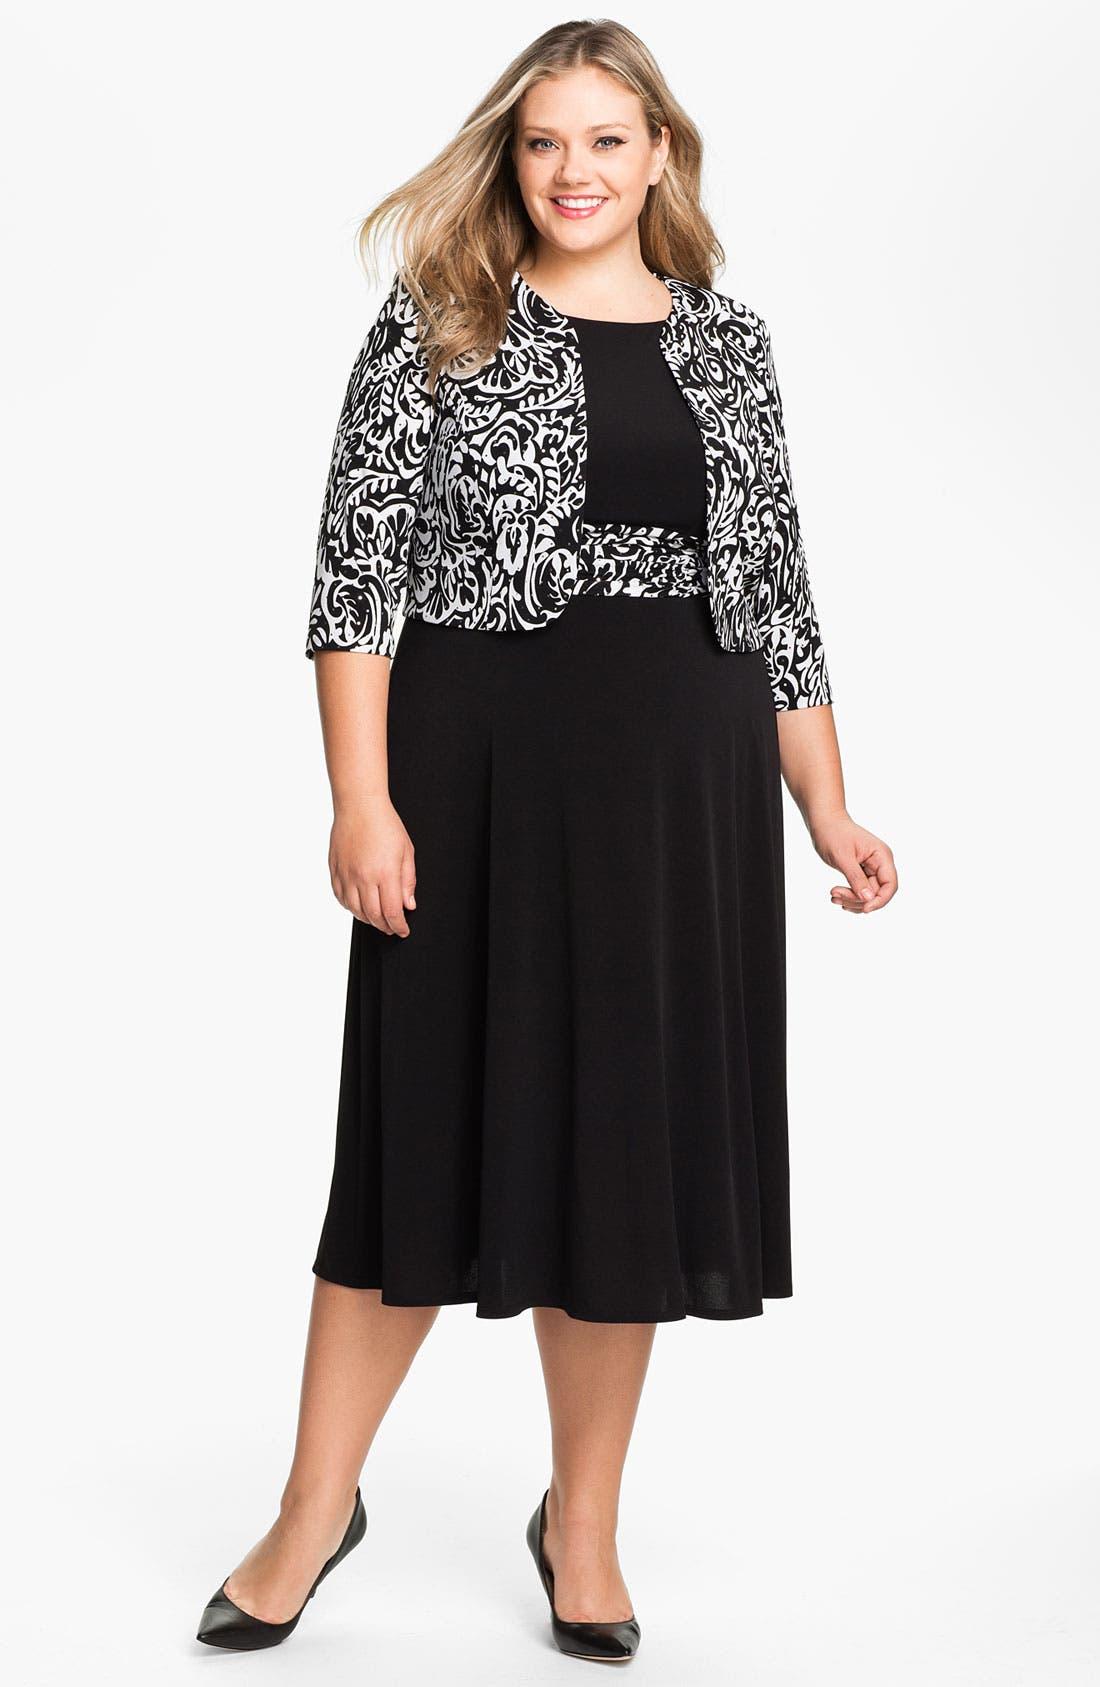 Alternate Image 1 Selected - Eliza J Sleeveless Empire Knit Dress & Bolero (Plus)